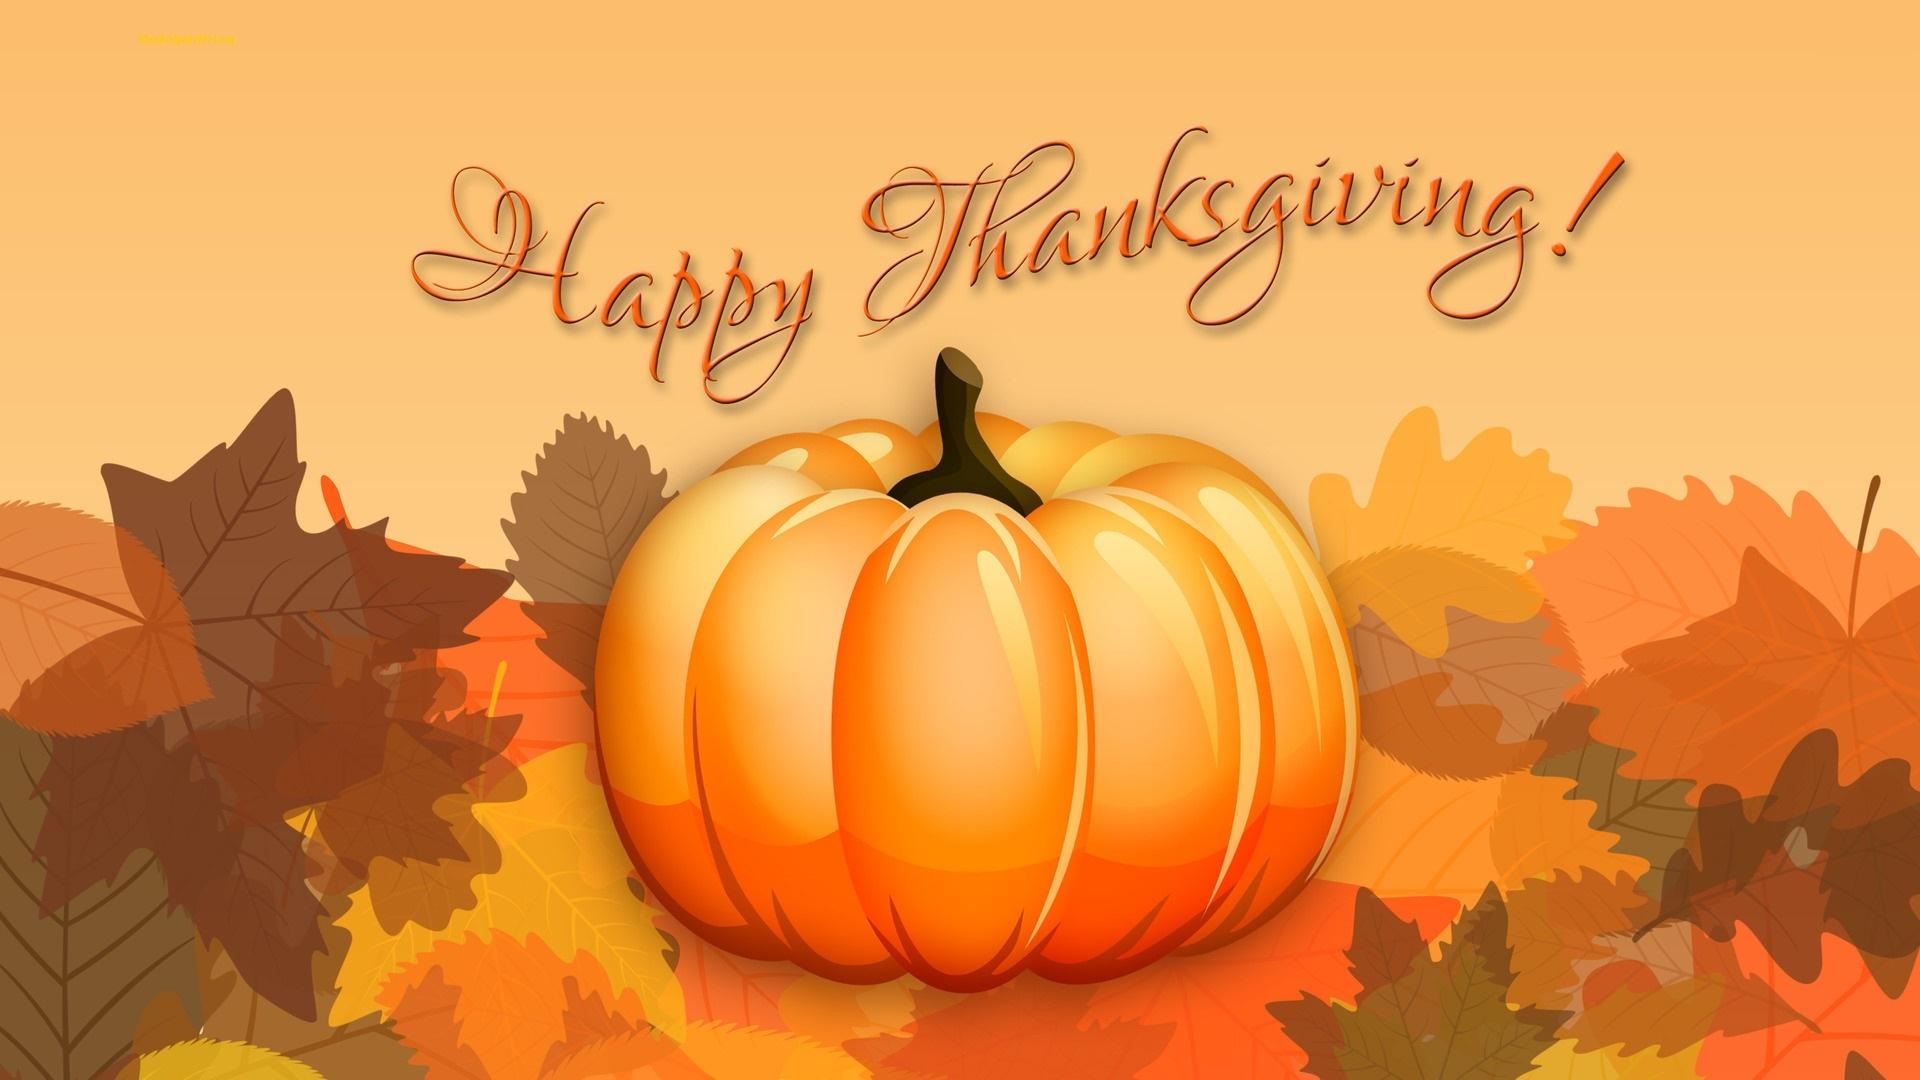 41 thanksgiving hd wallpapers 1920x1200 on wallpapersafari - Thanksgiving day wallpaper 3d ...